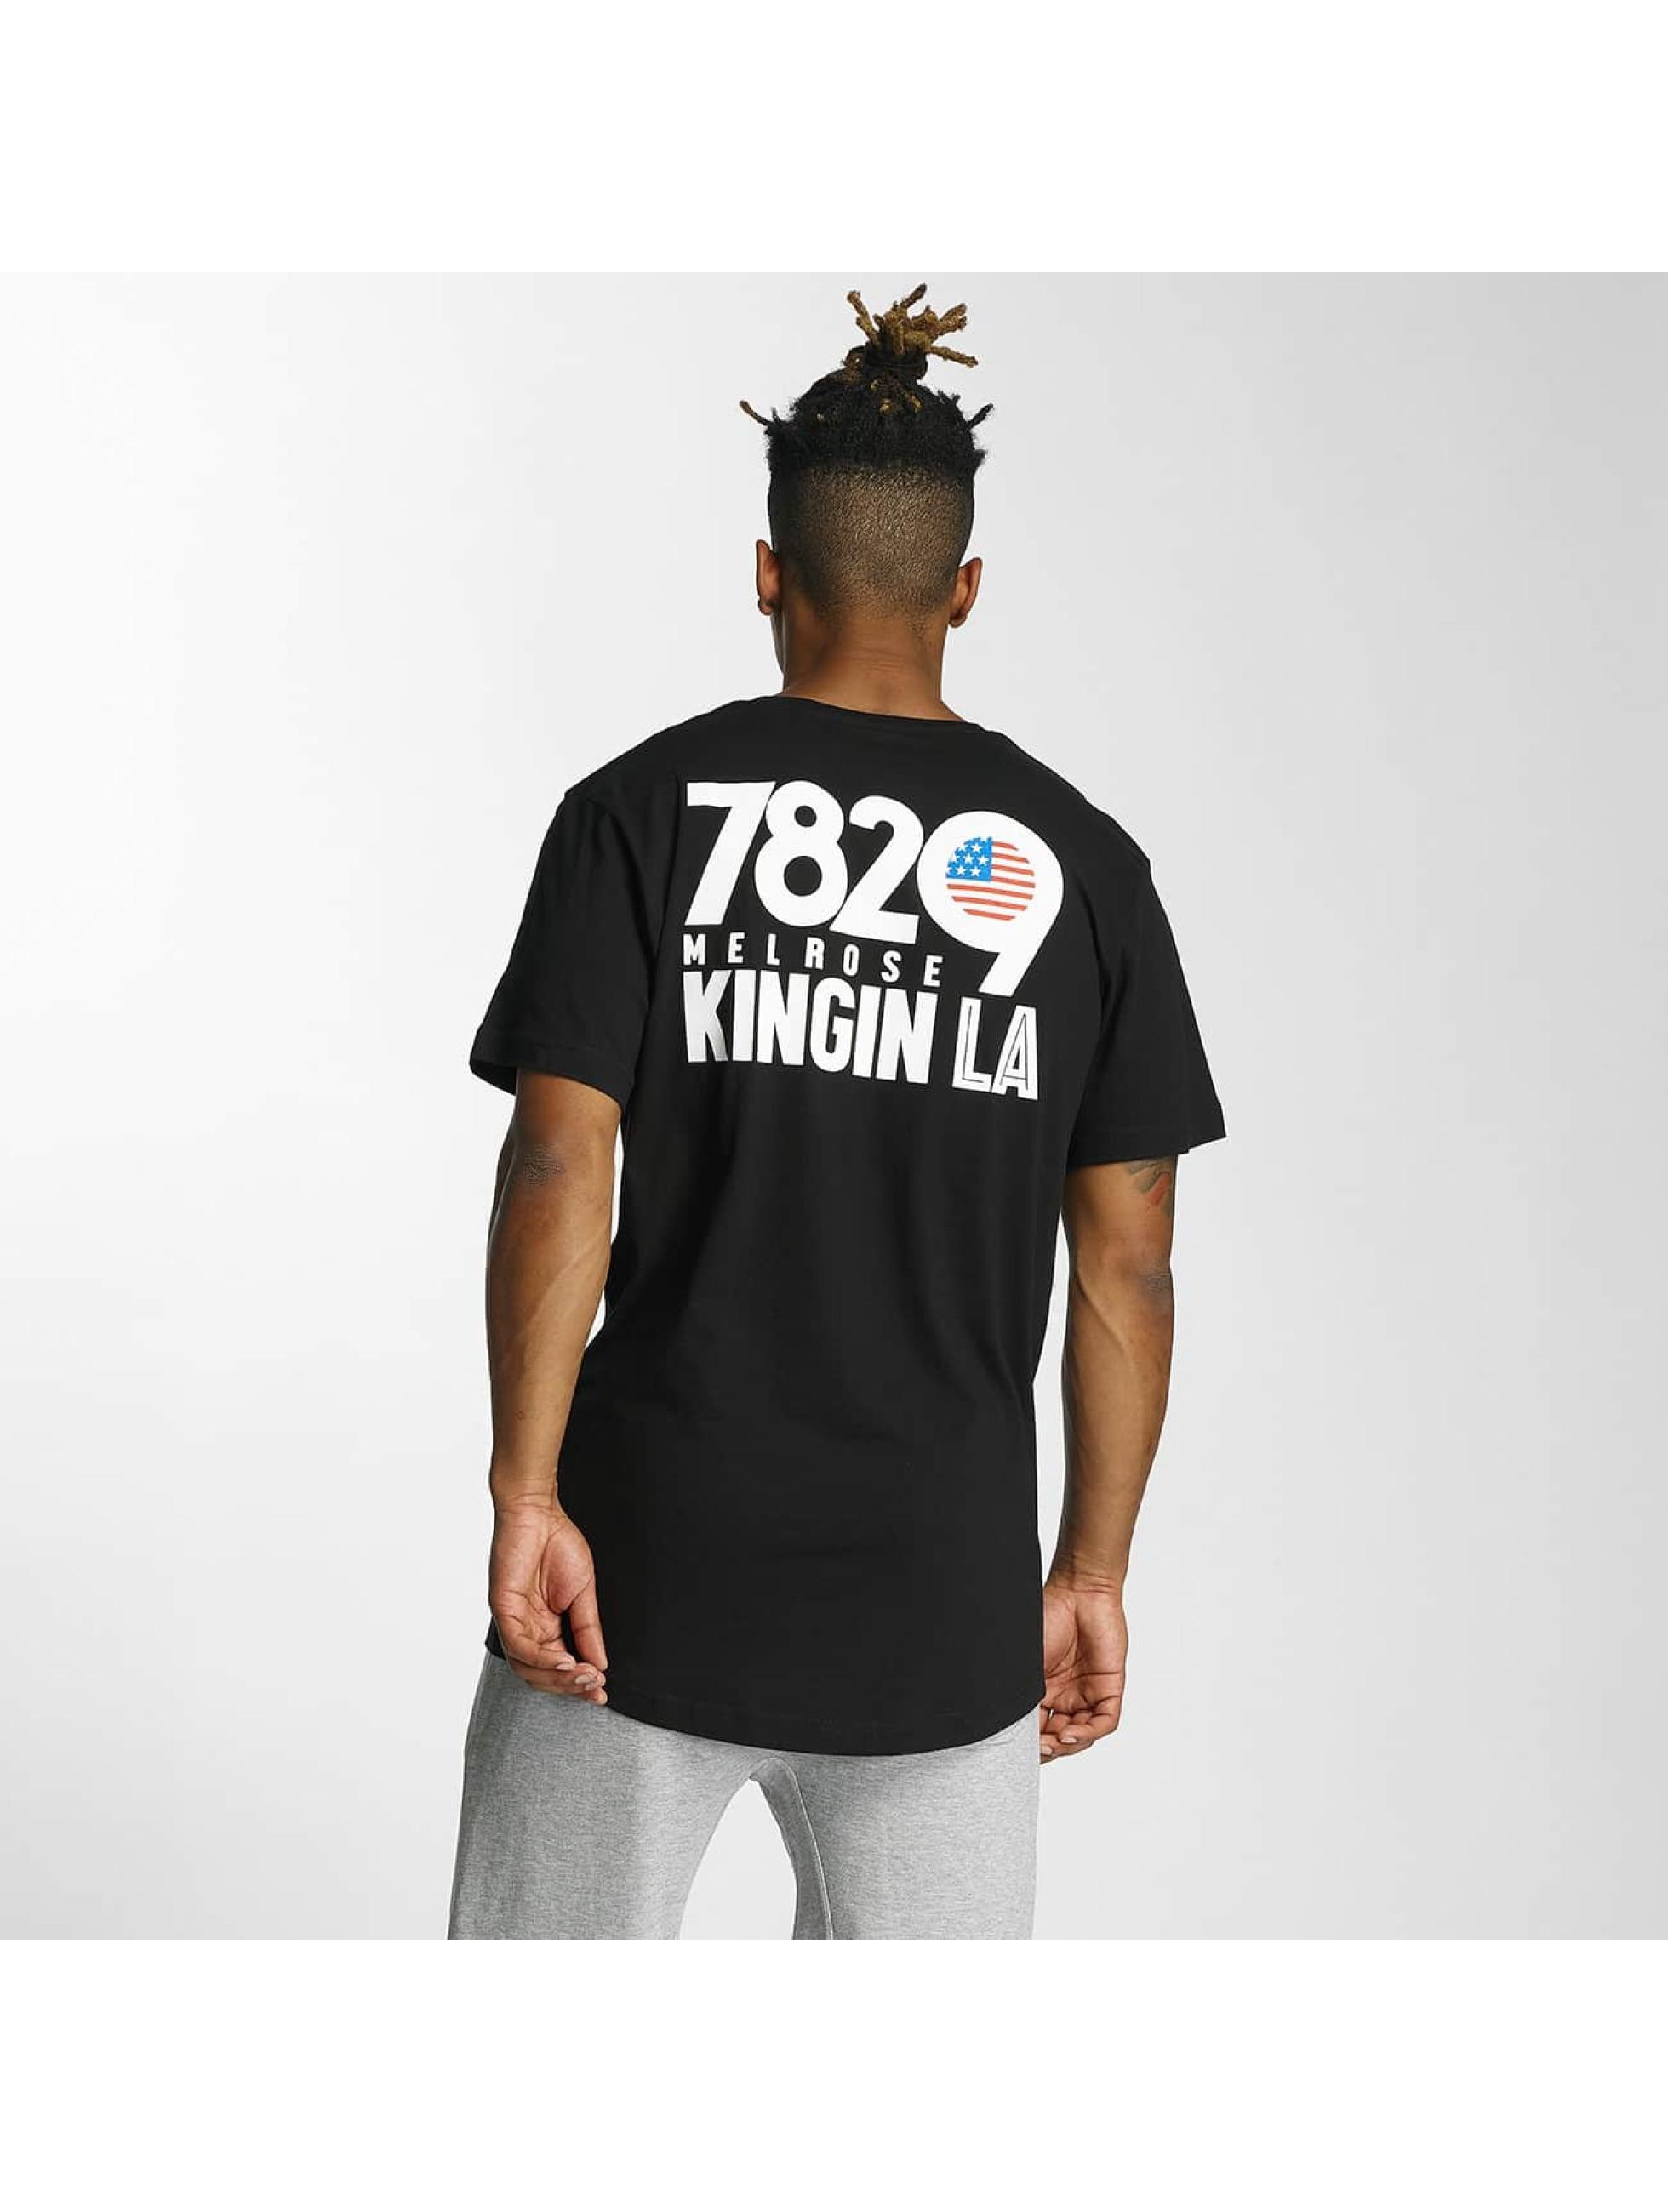 Kingin Camiseta Melrose negro